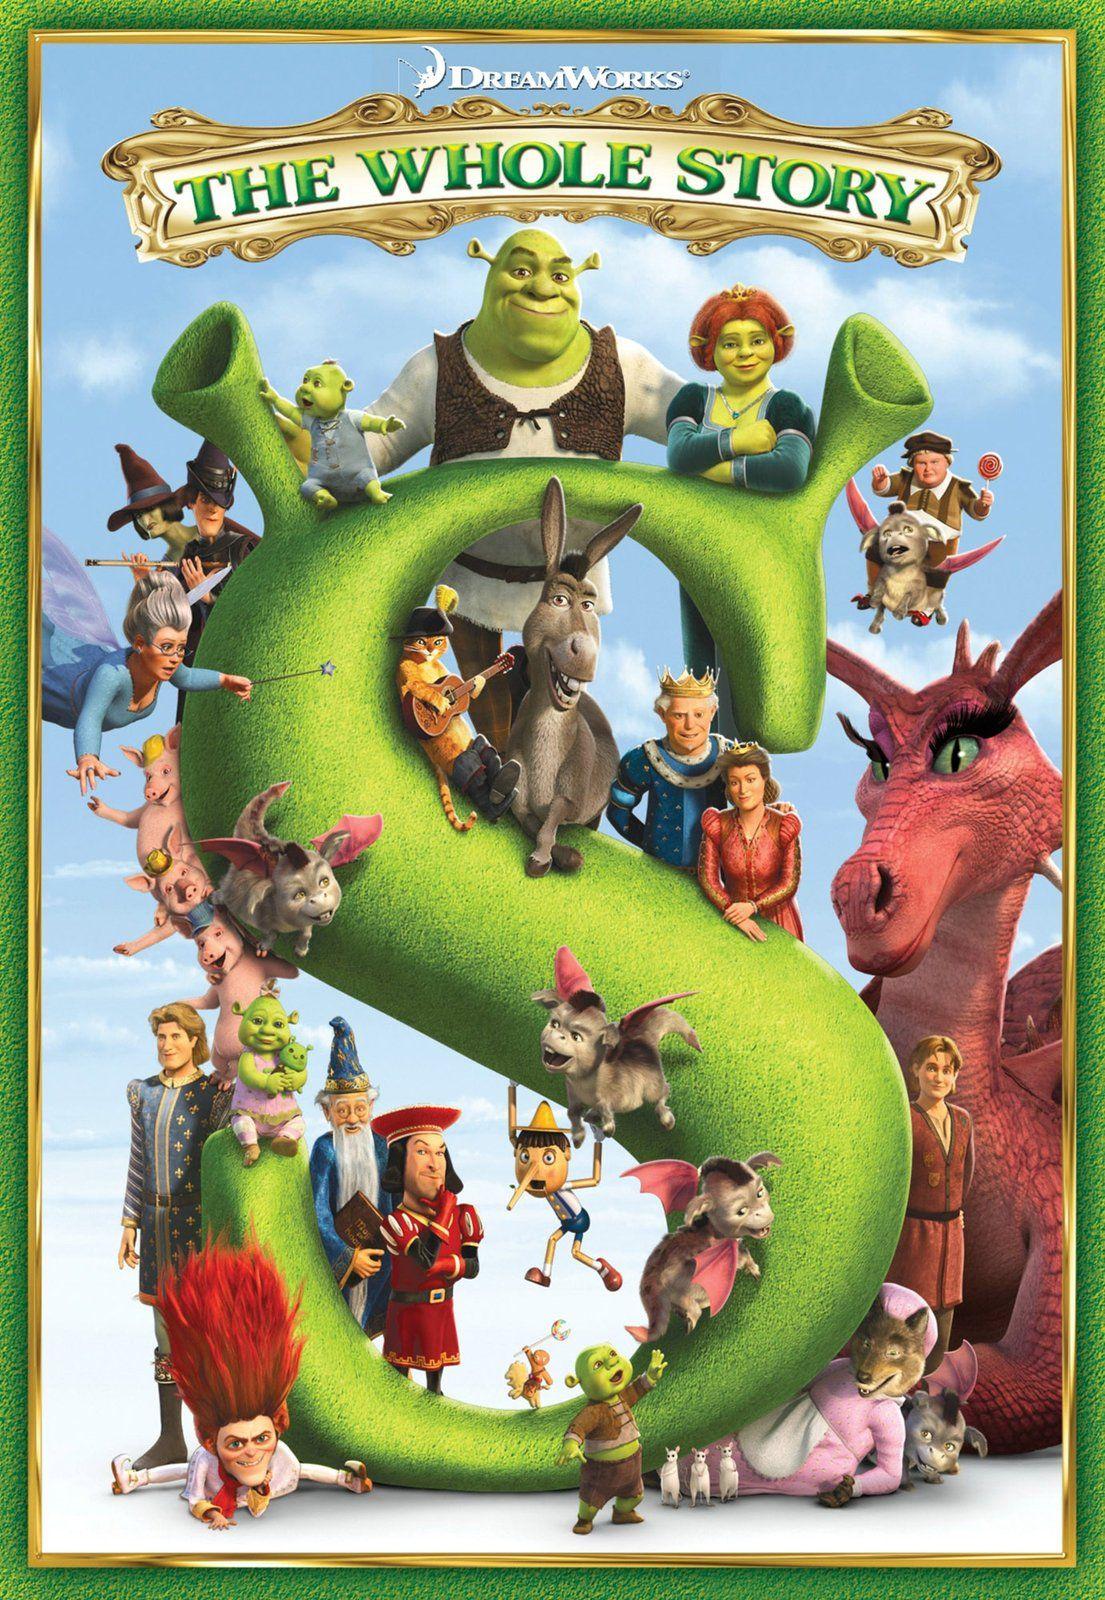 Dreamworks Shrek 1 2 3 Forever After Boxed Set Free Shipping Shrek El Nino Pelicula Peliculas De Disney